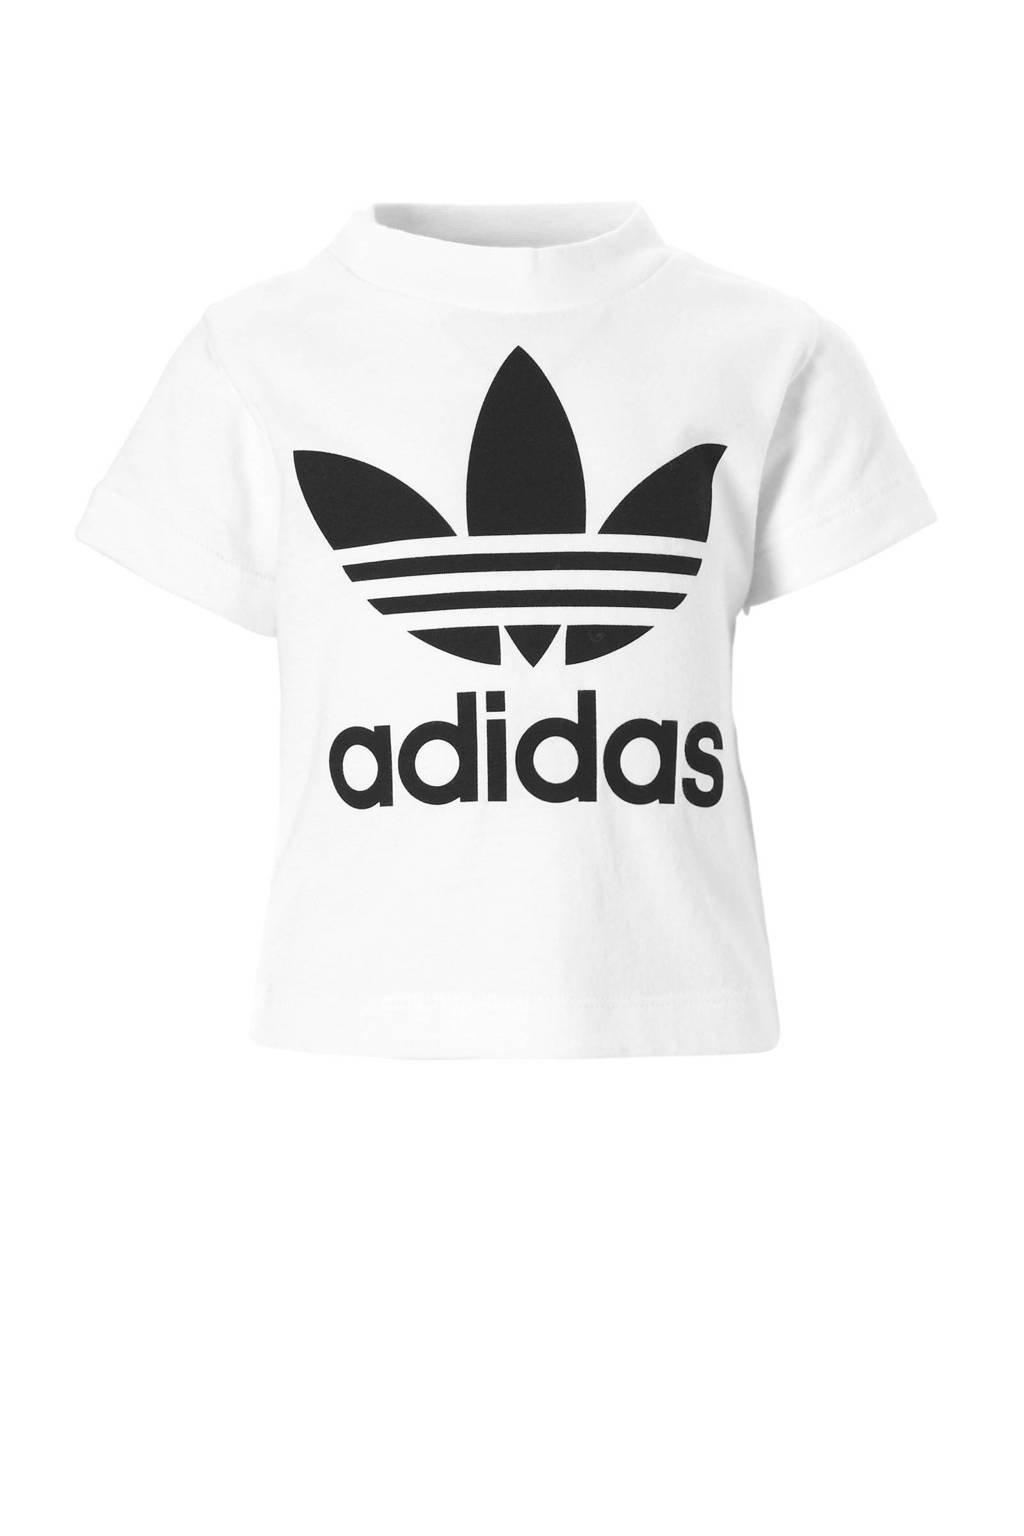 adidas originals T-shirt, Wit/zwart